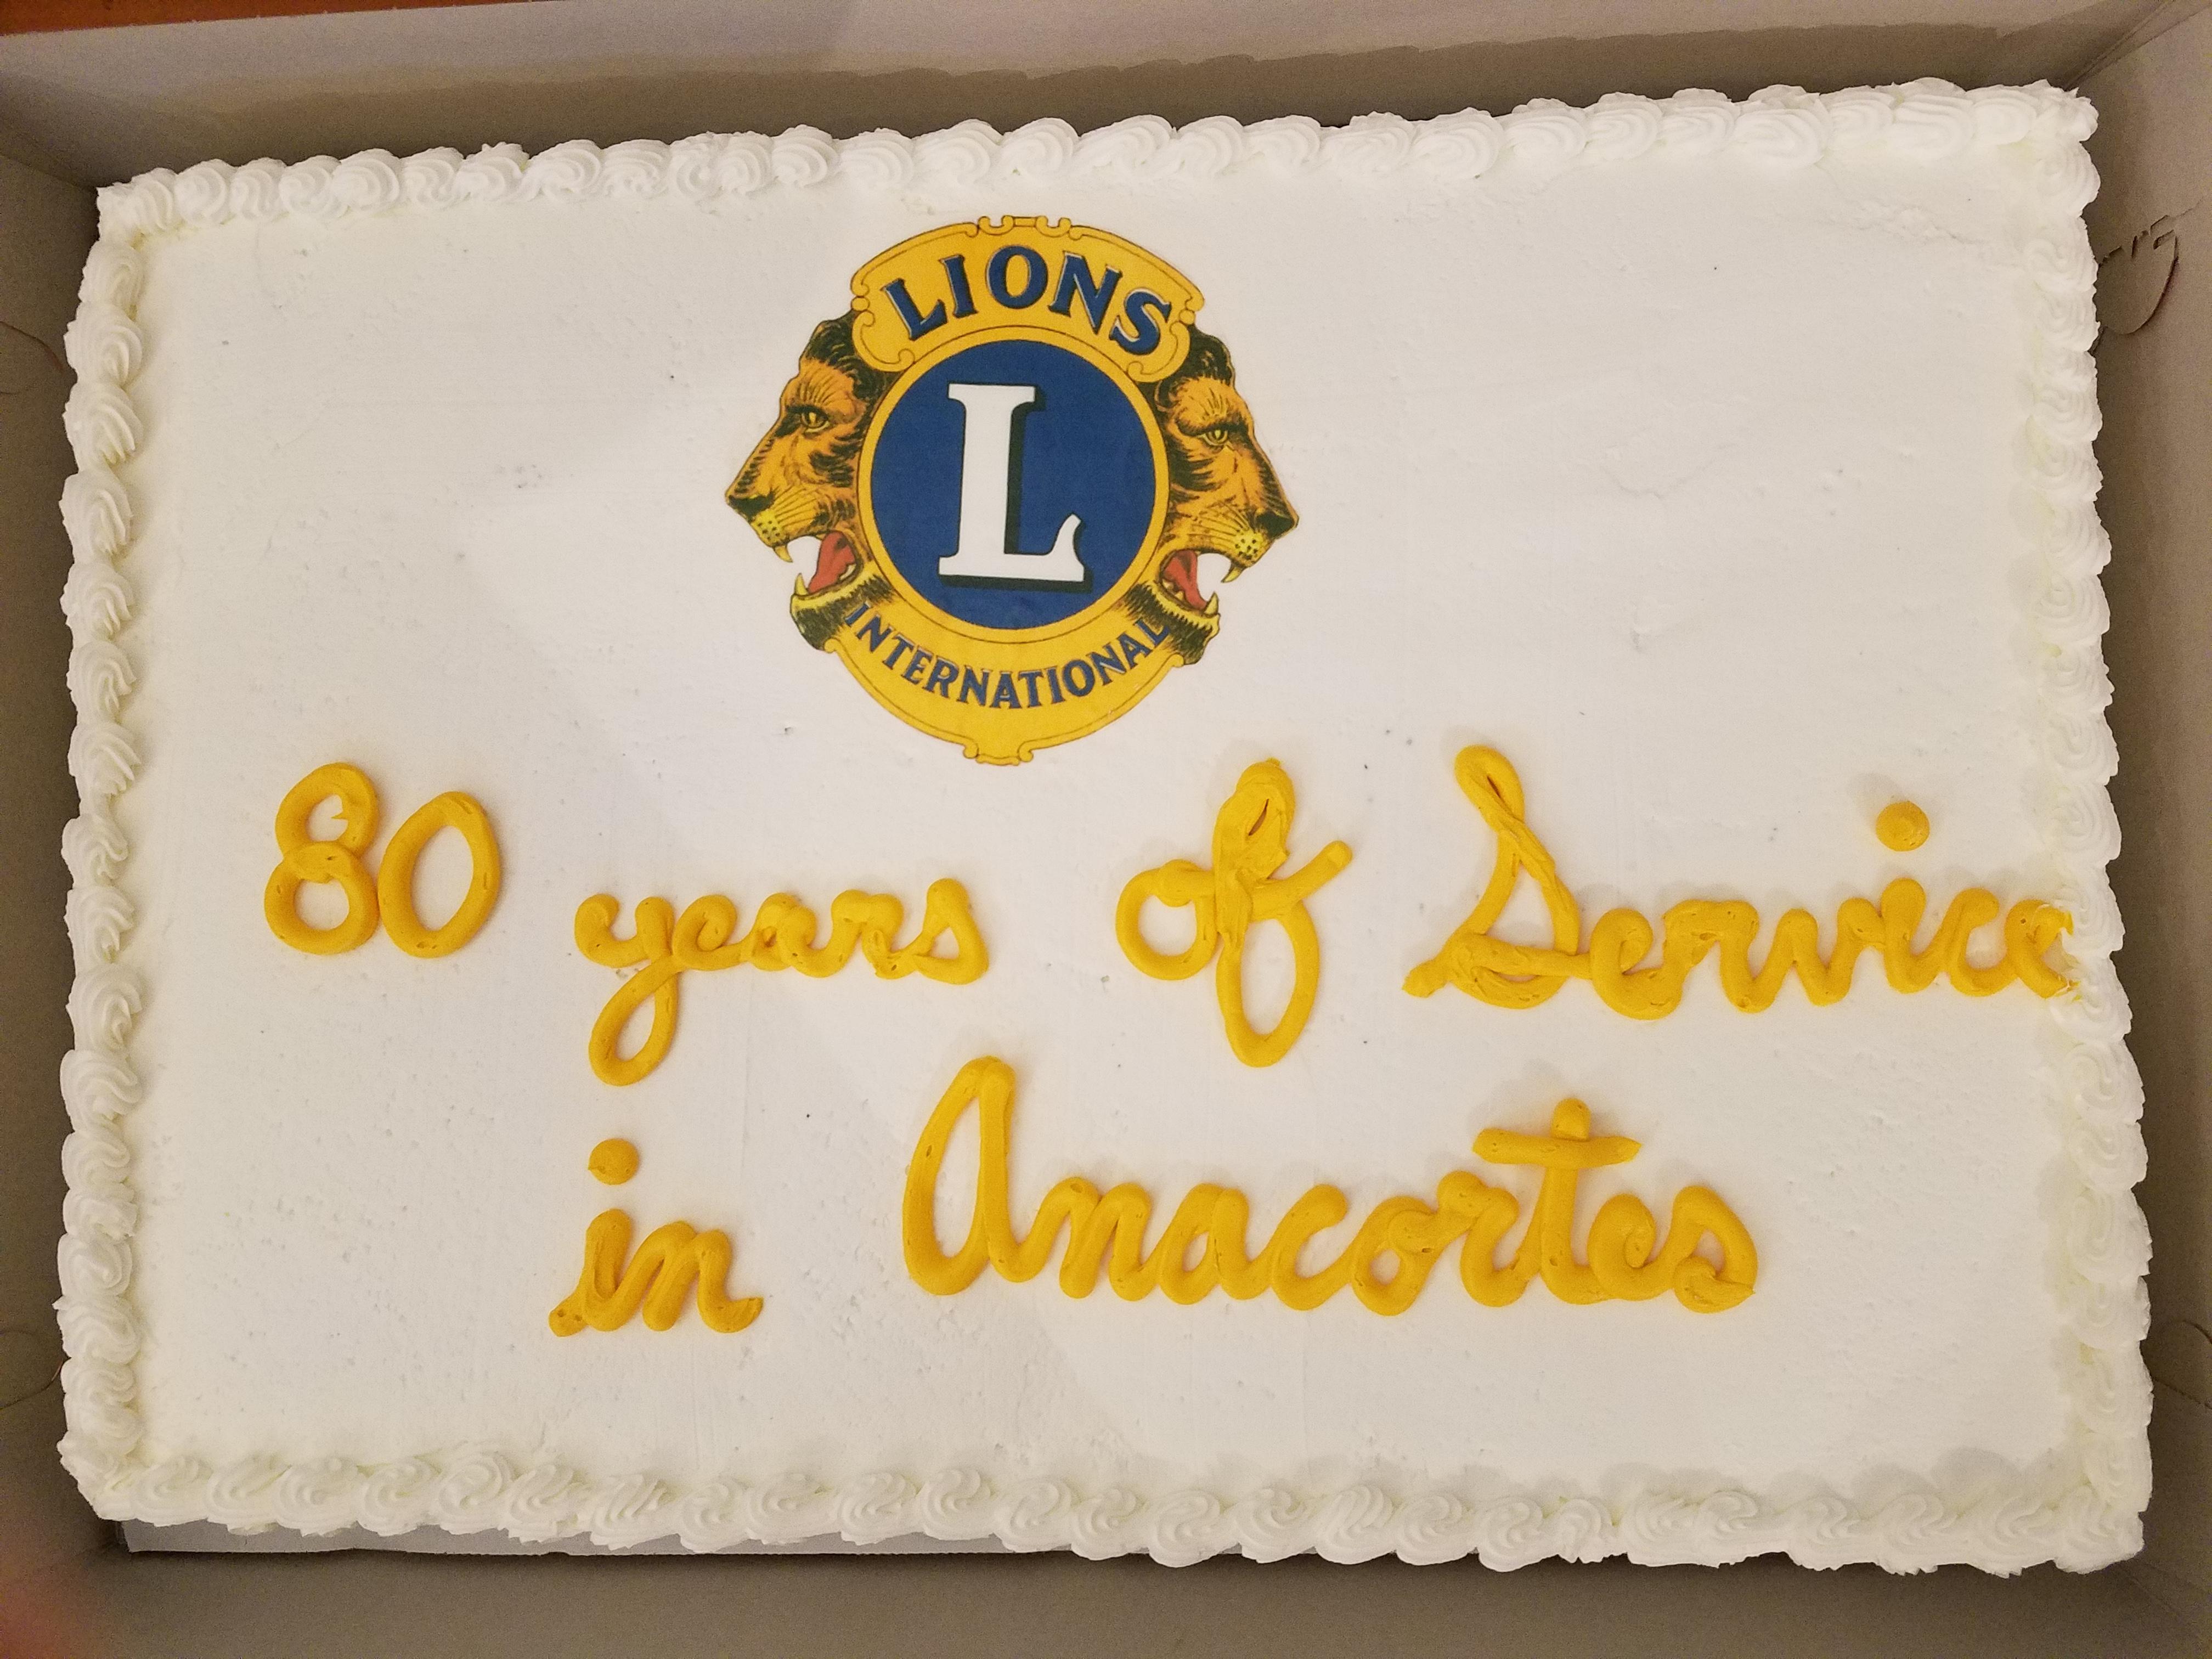 Lions Club of Anacortes Celebrates 80 years!